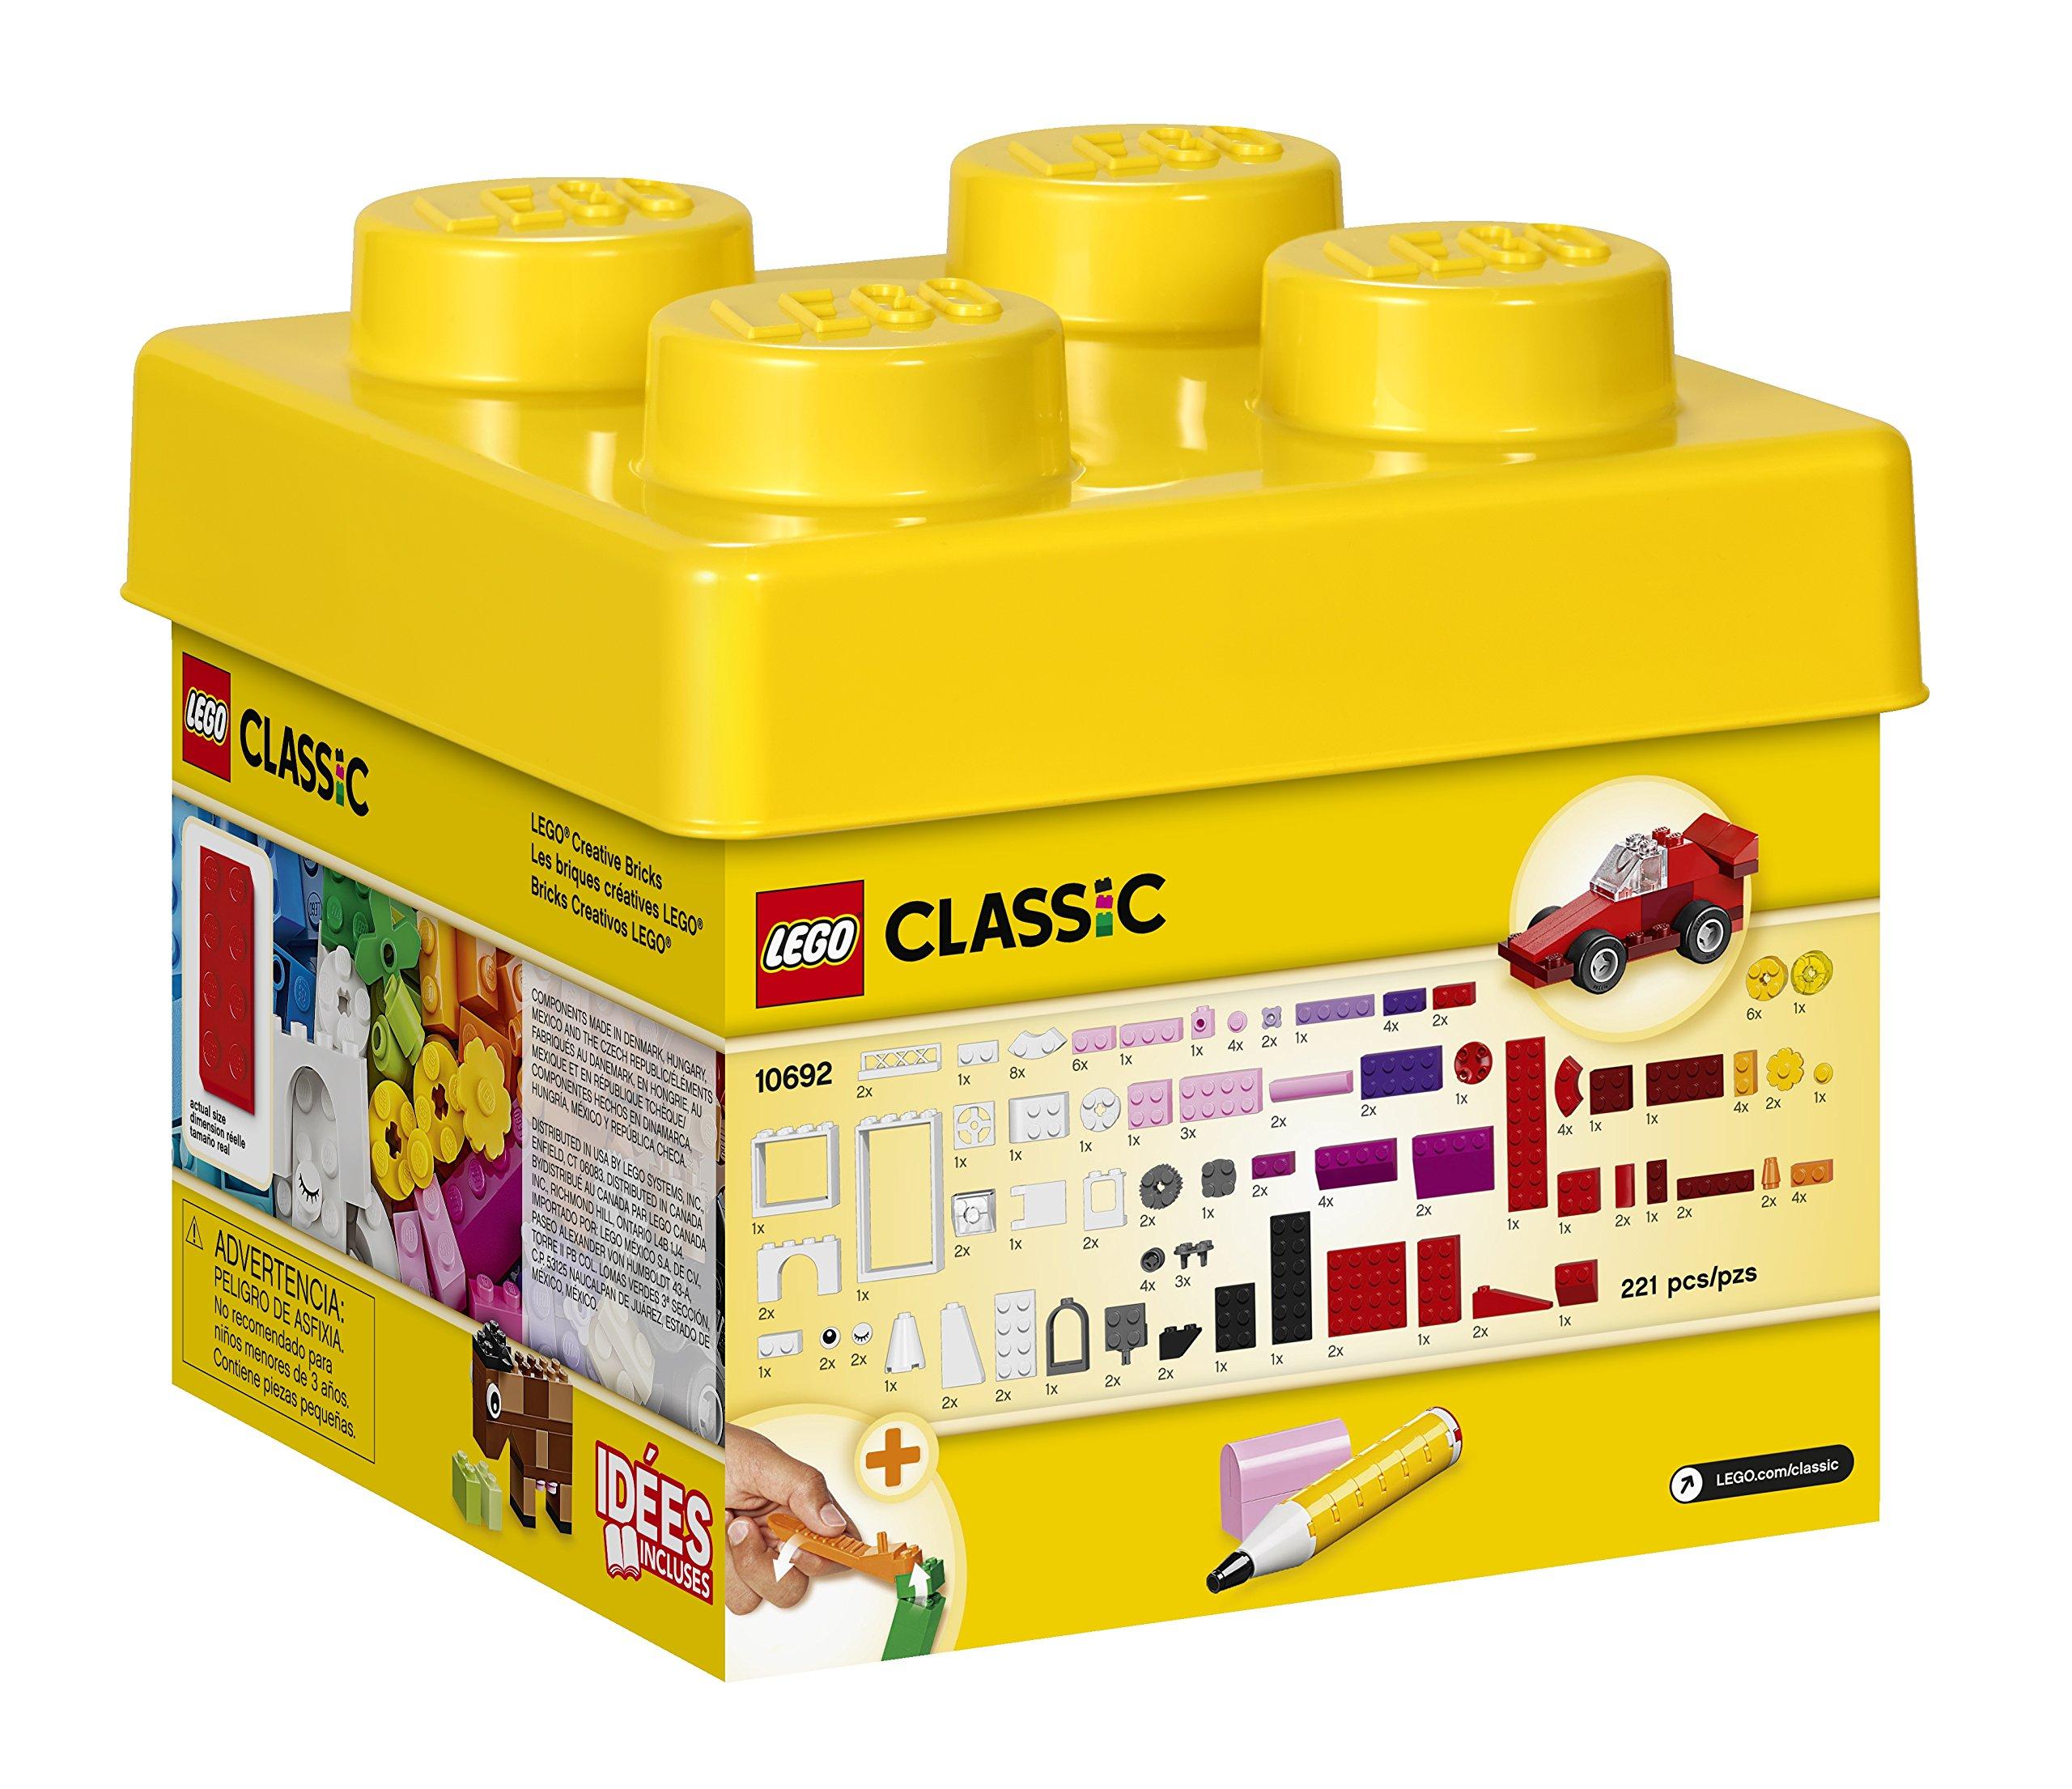 LEGO Classic Creative Bricks 10692 Building Blocks, Learning Toy by LEGO (Image #3)